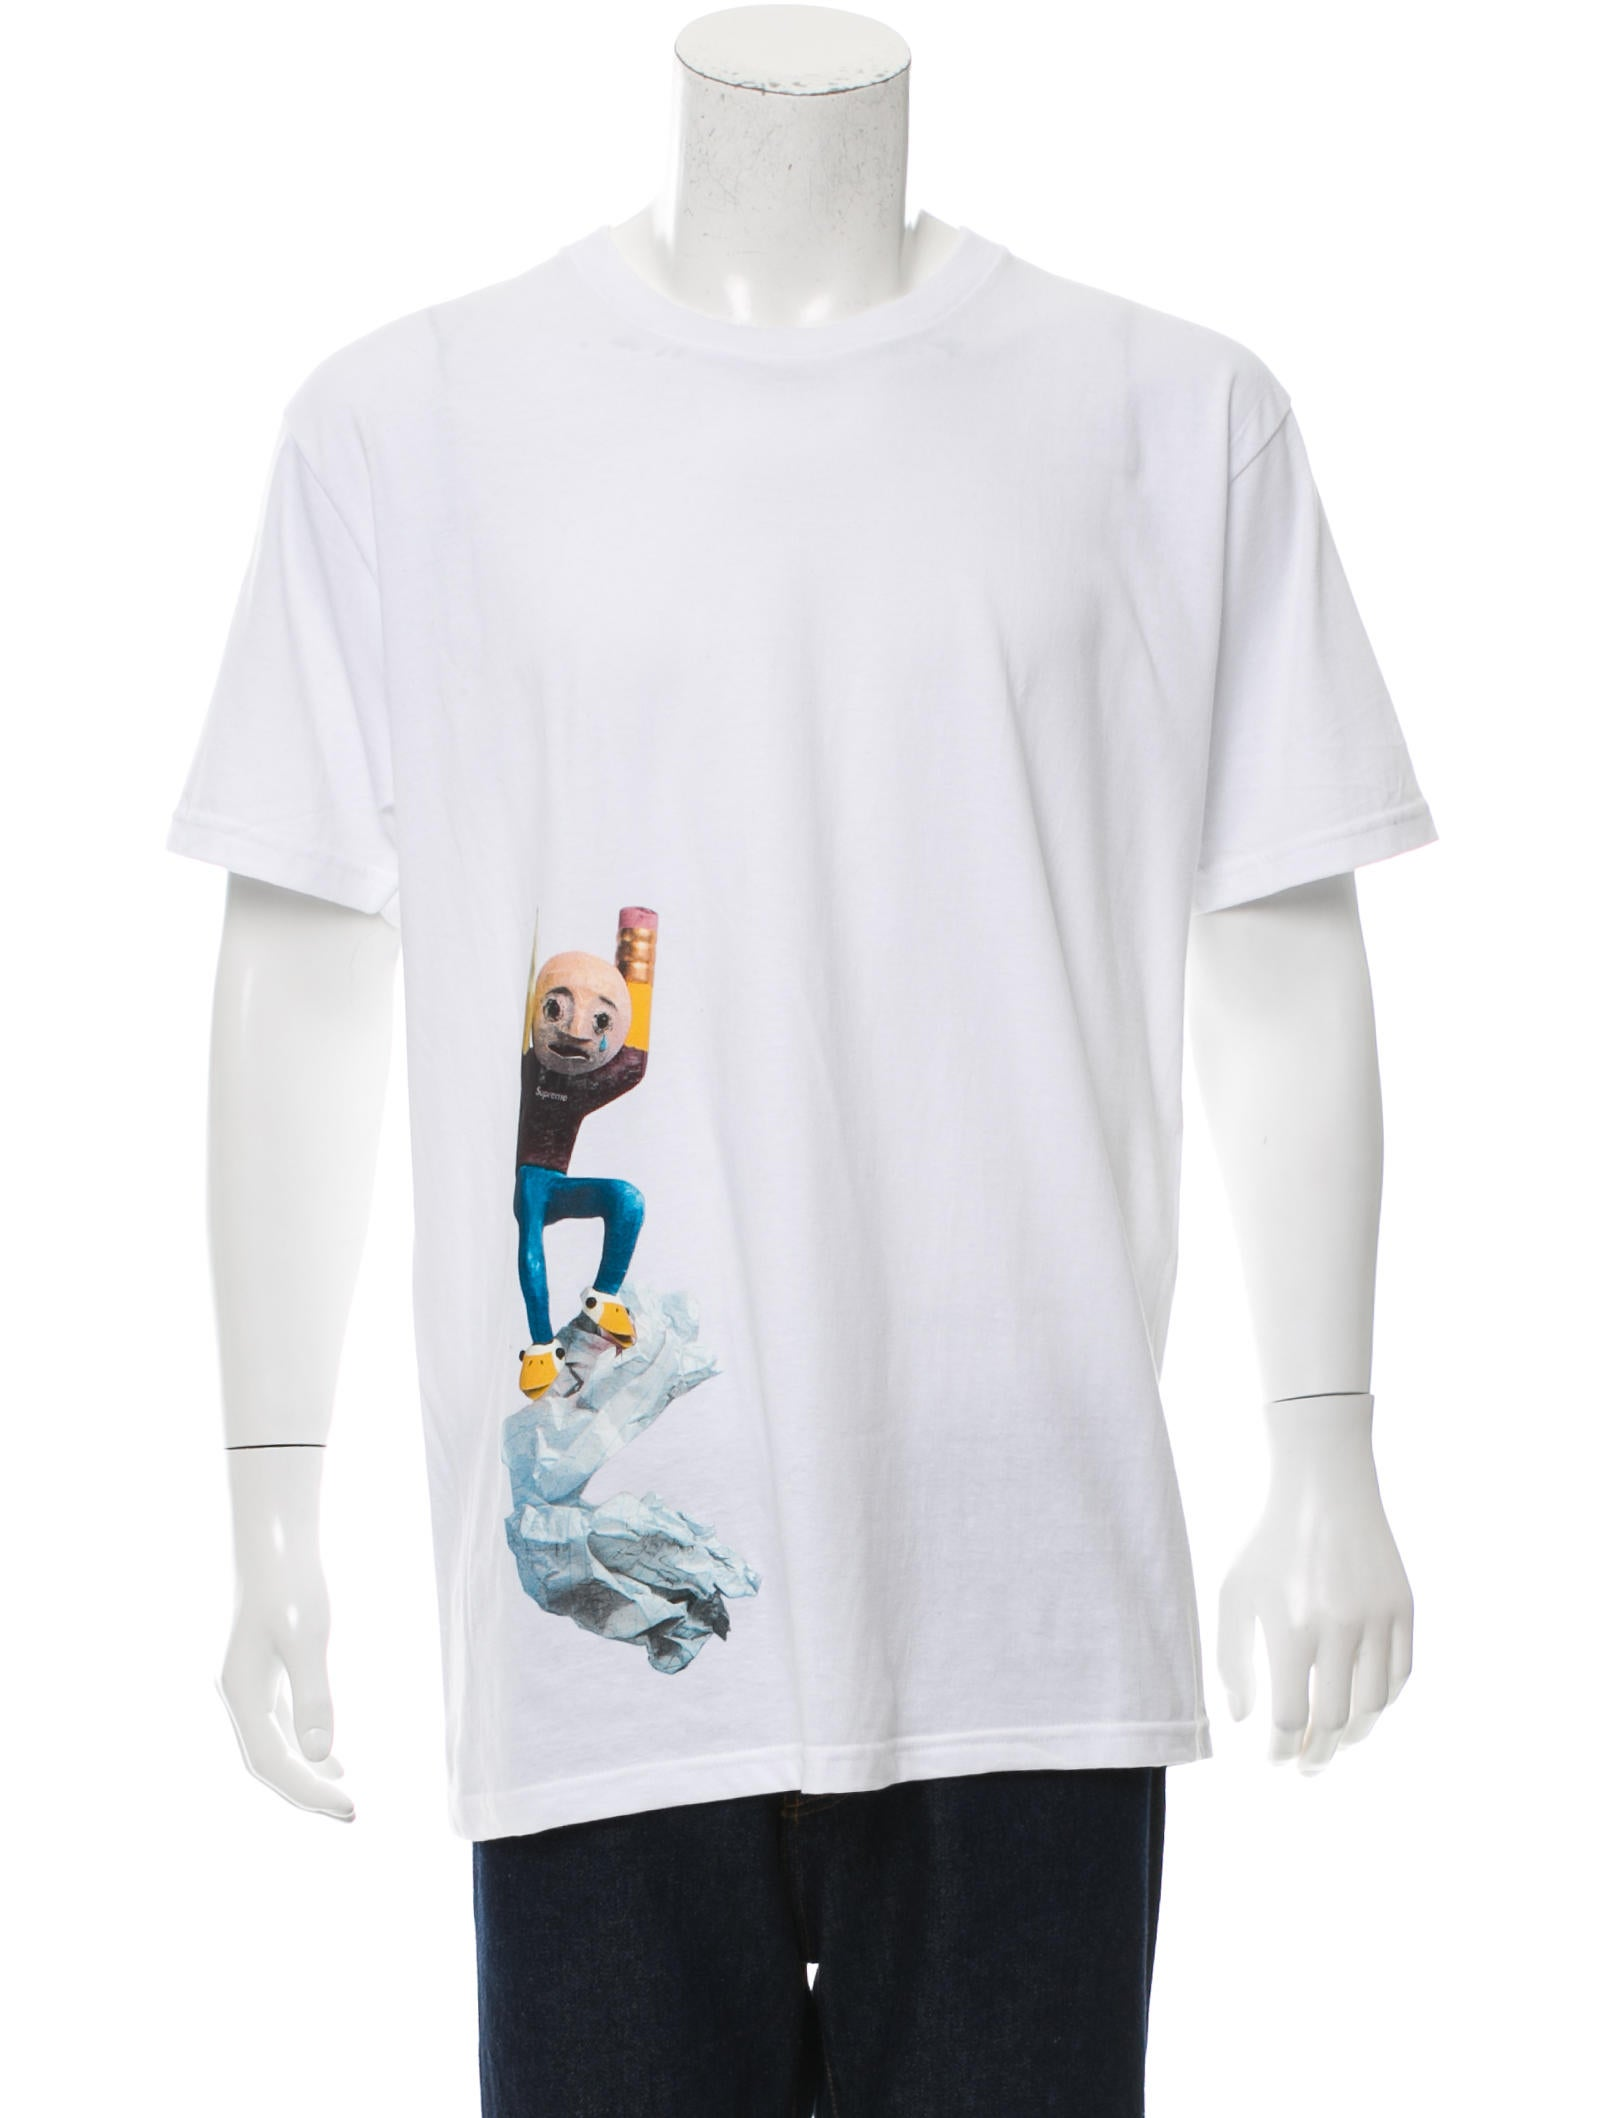 supreme 2017 i regret everything t shirt clothing